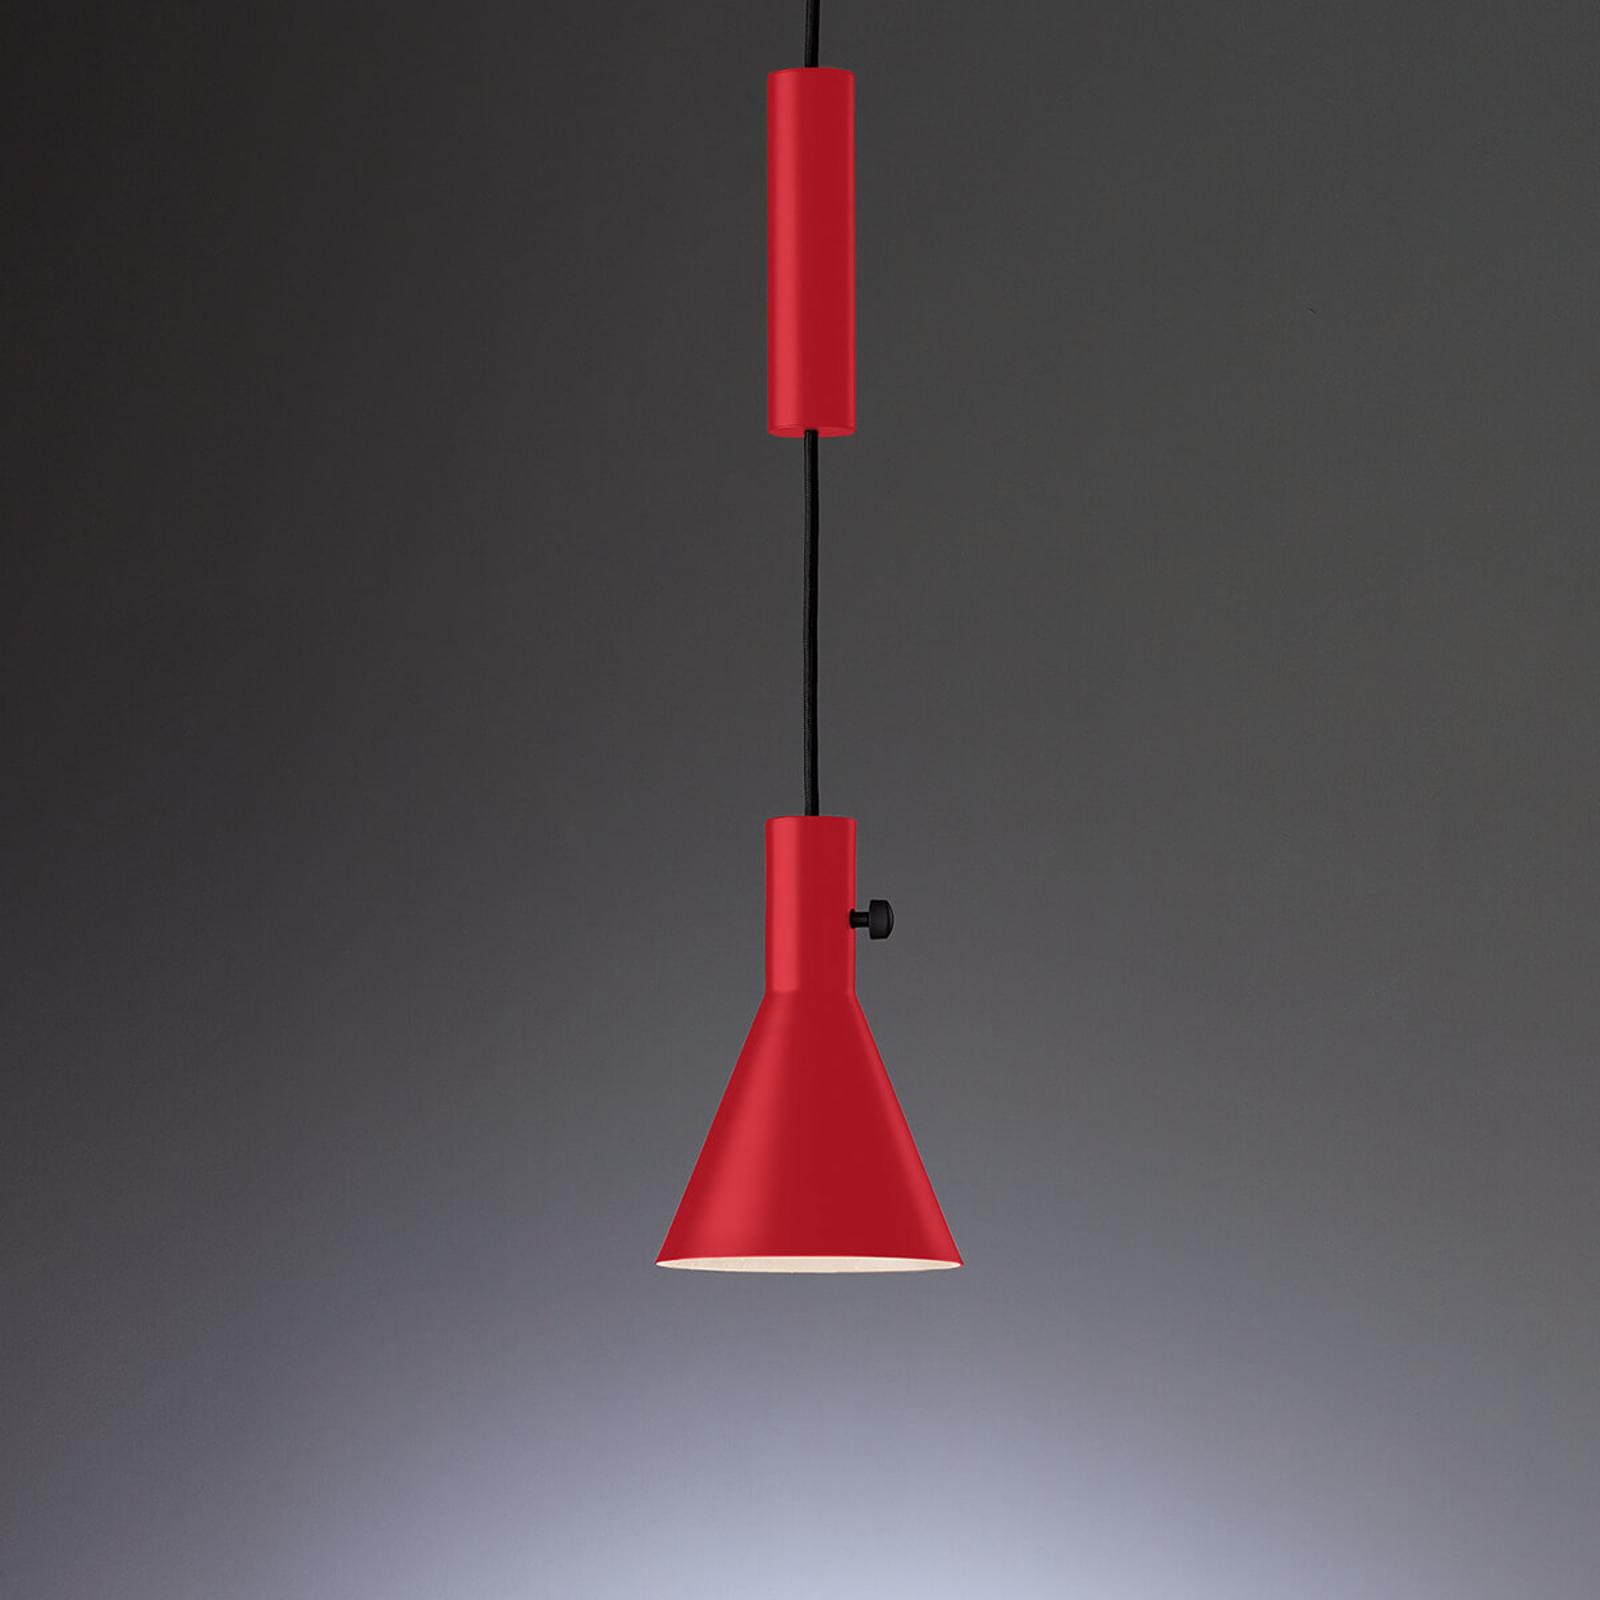 Eleu toppmoderne rød LED pendellampe